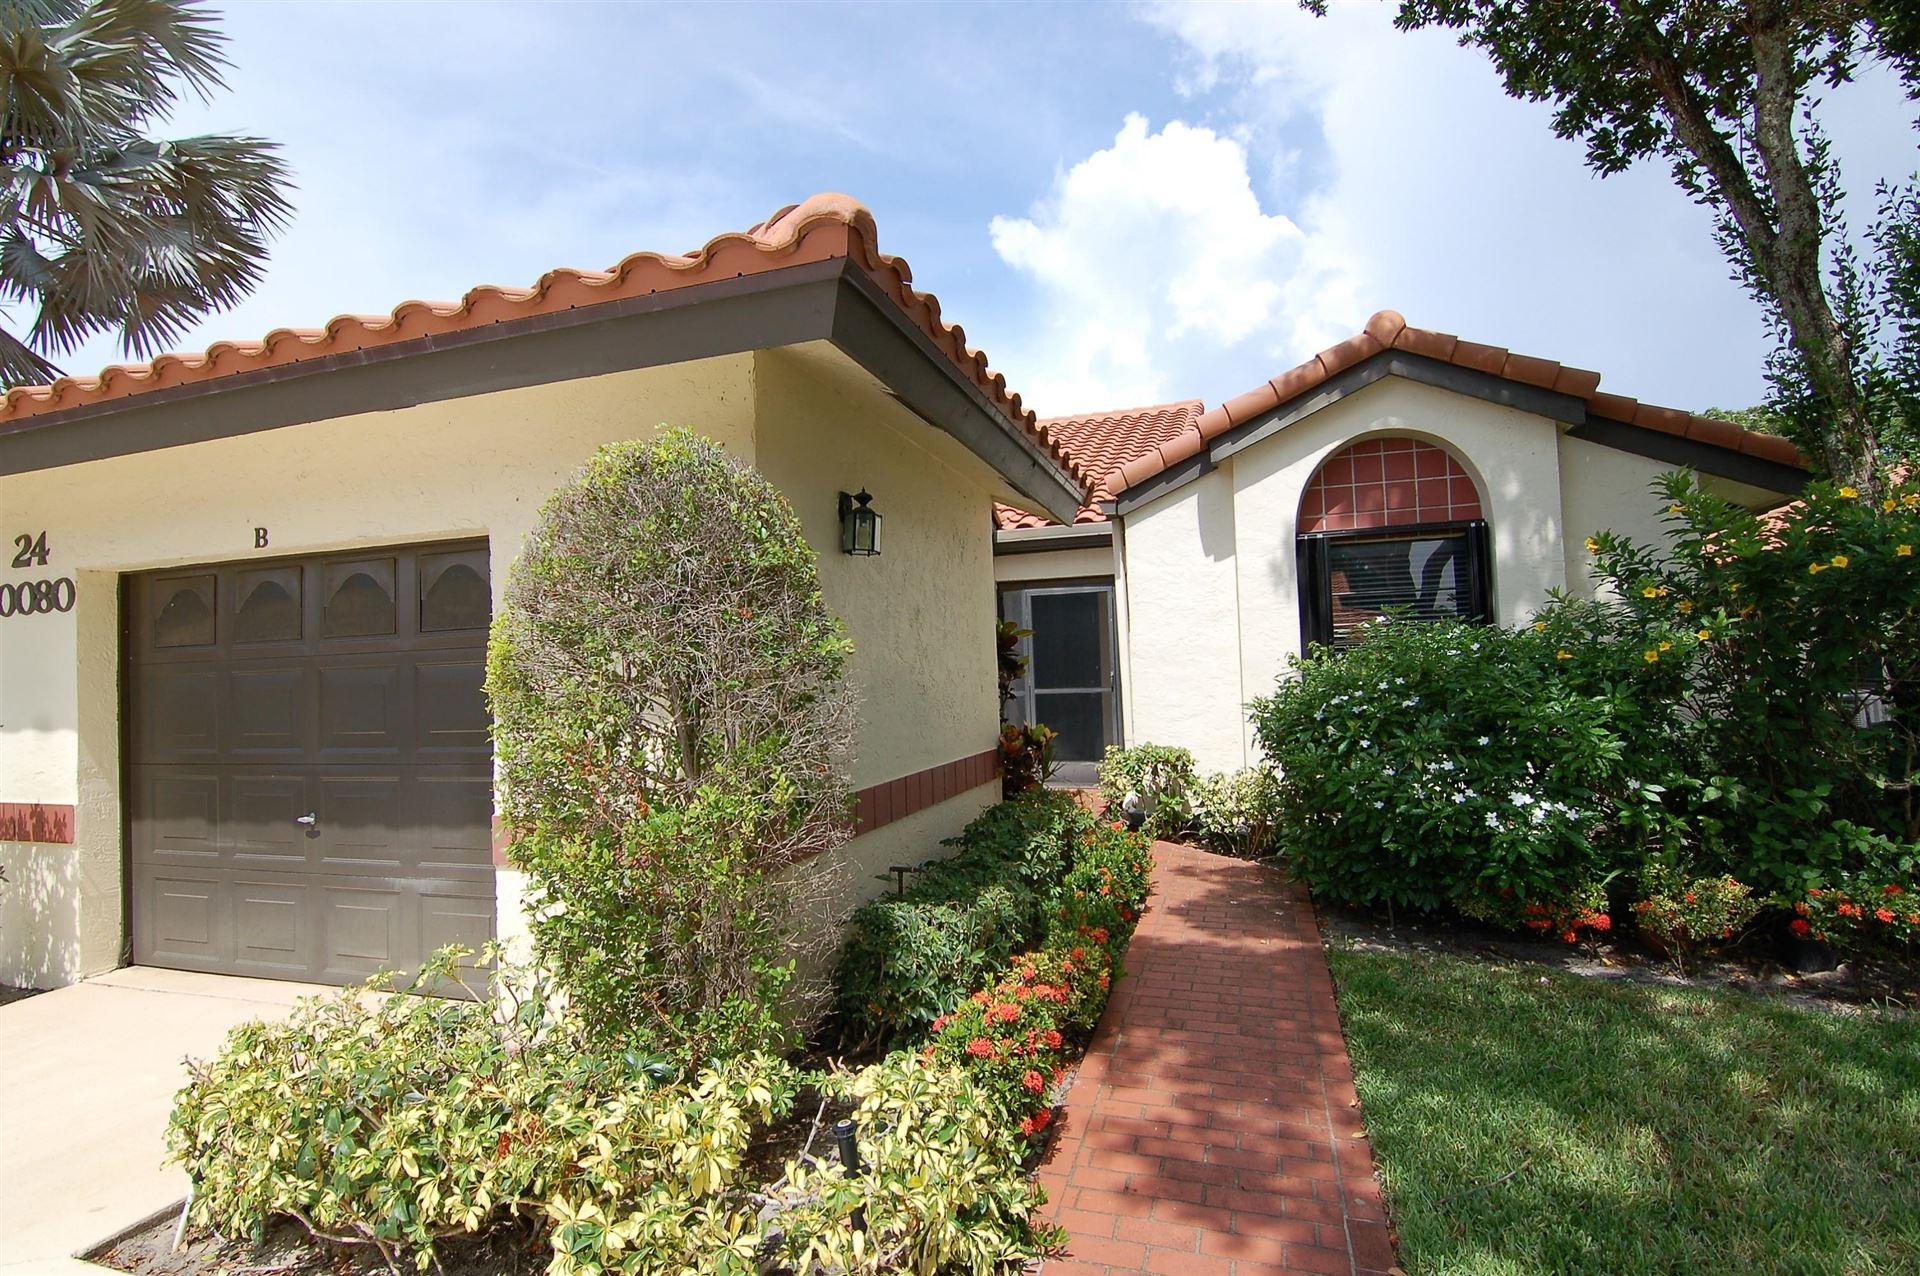 10080 Andrea Lane #B, Boynton Beach, FL 33437 - #: RX-10637948